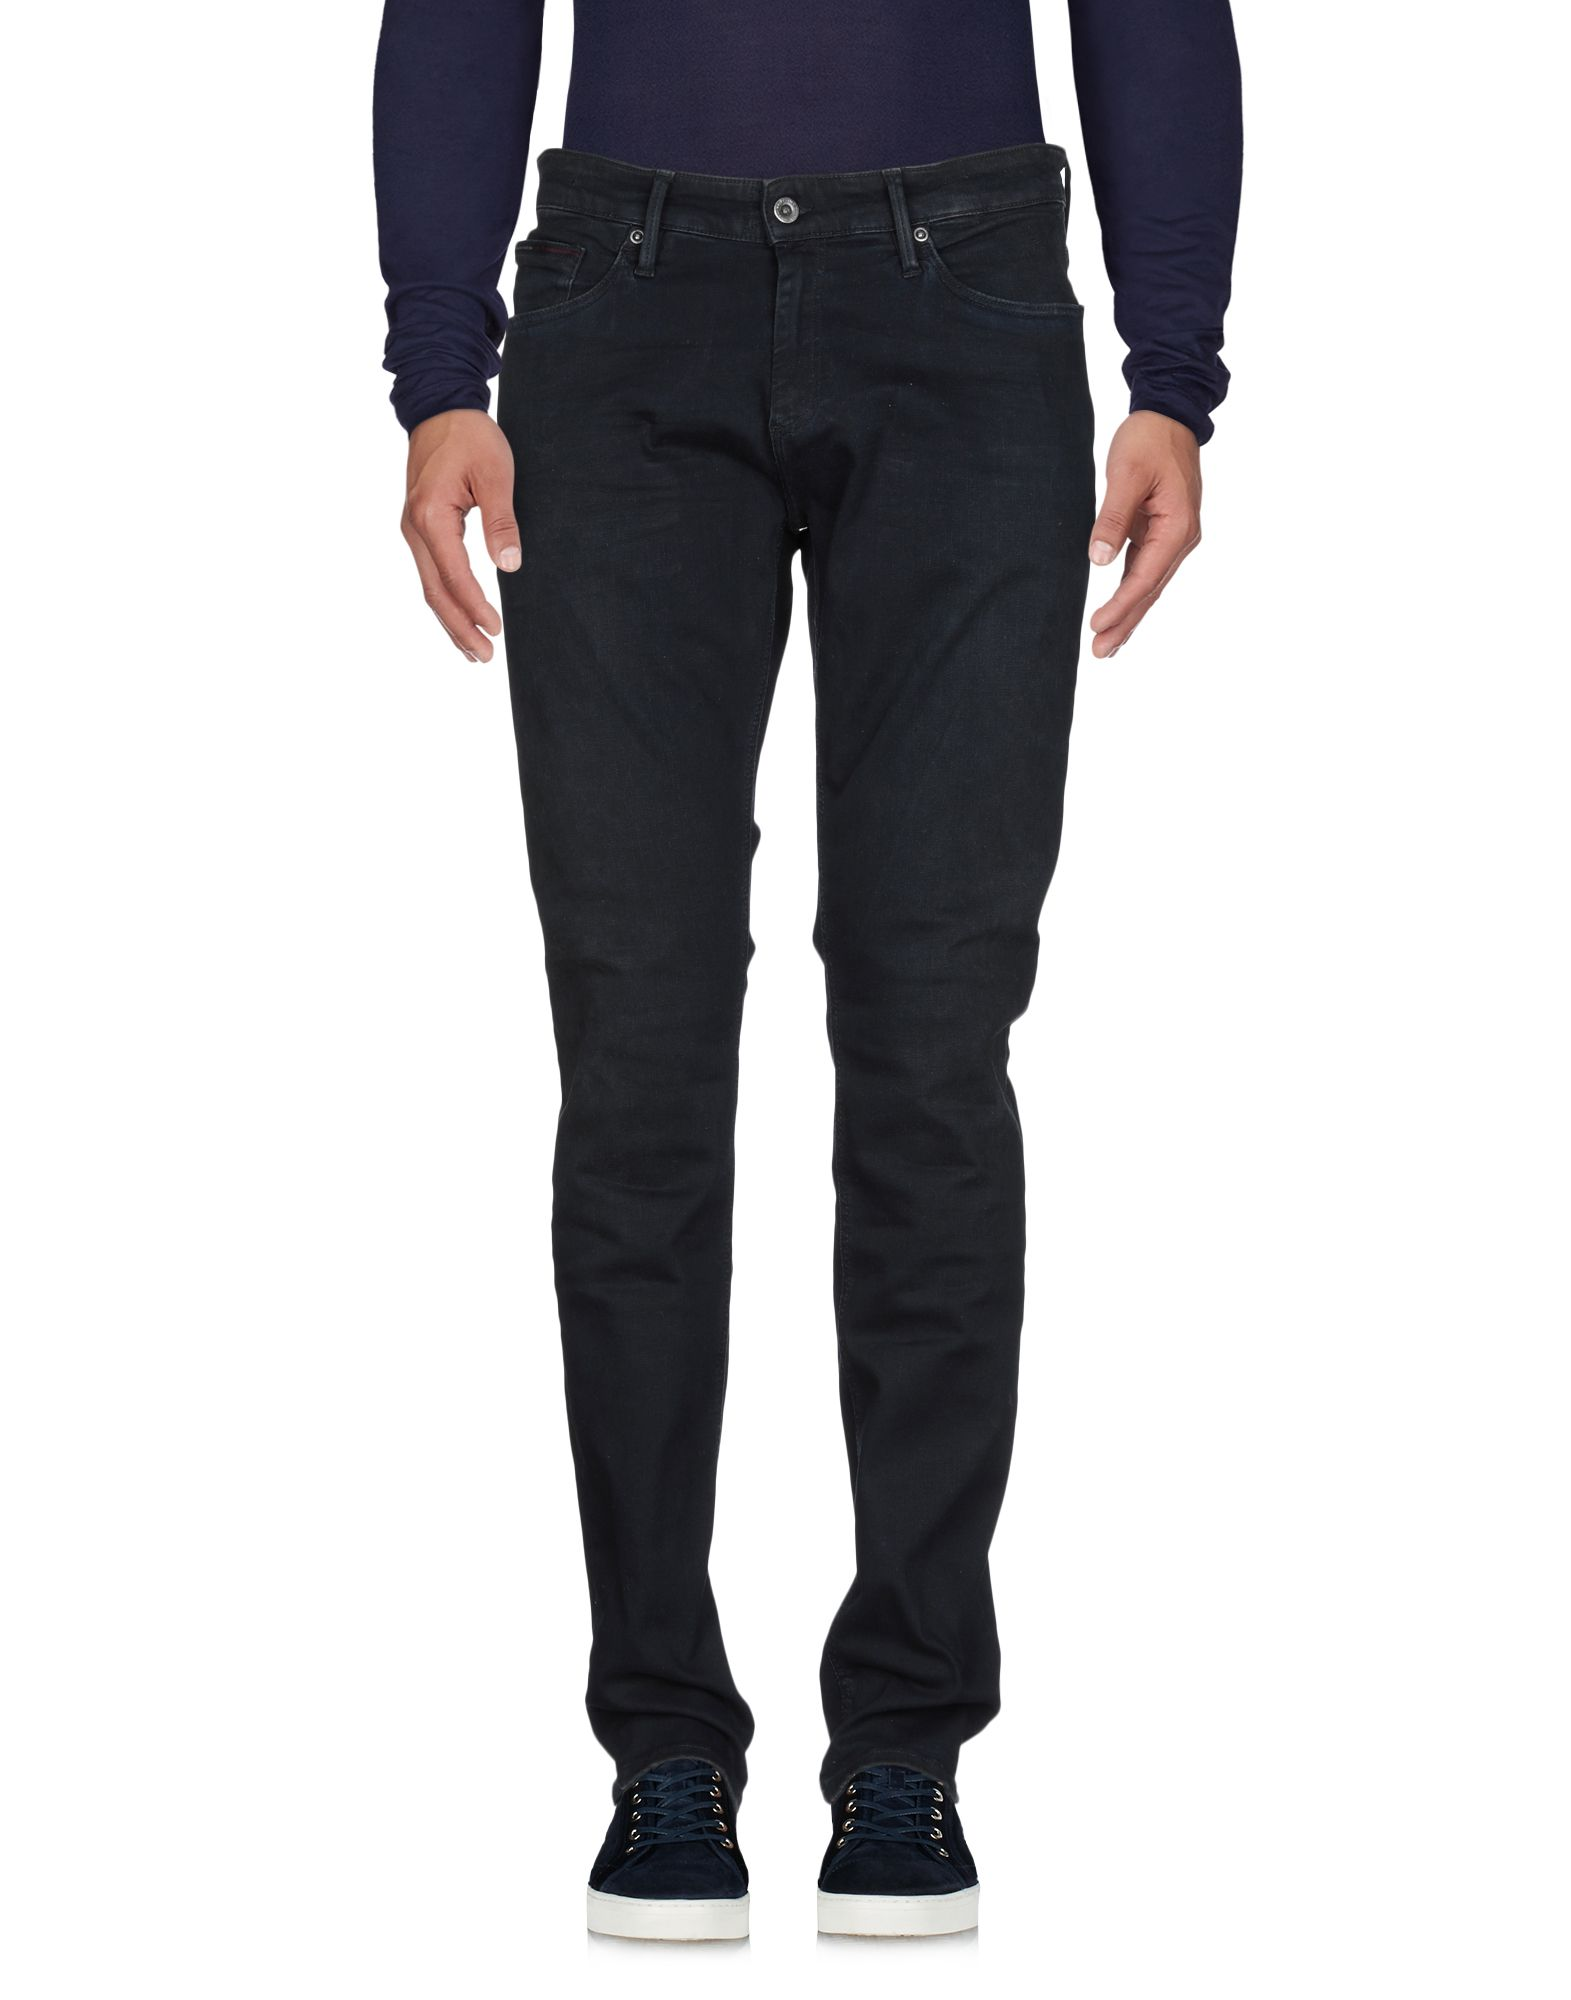 Pantaloni - Jeans Tommy Jeans Uomo - Pantaloni 42686137GB f07307